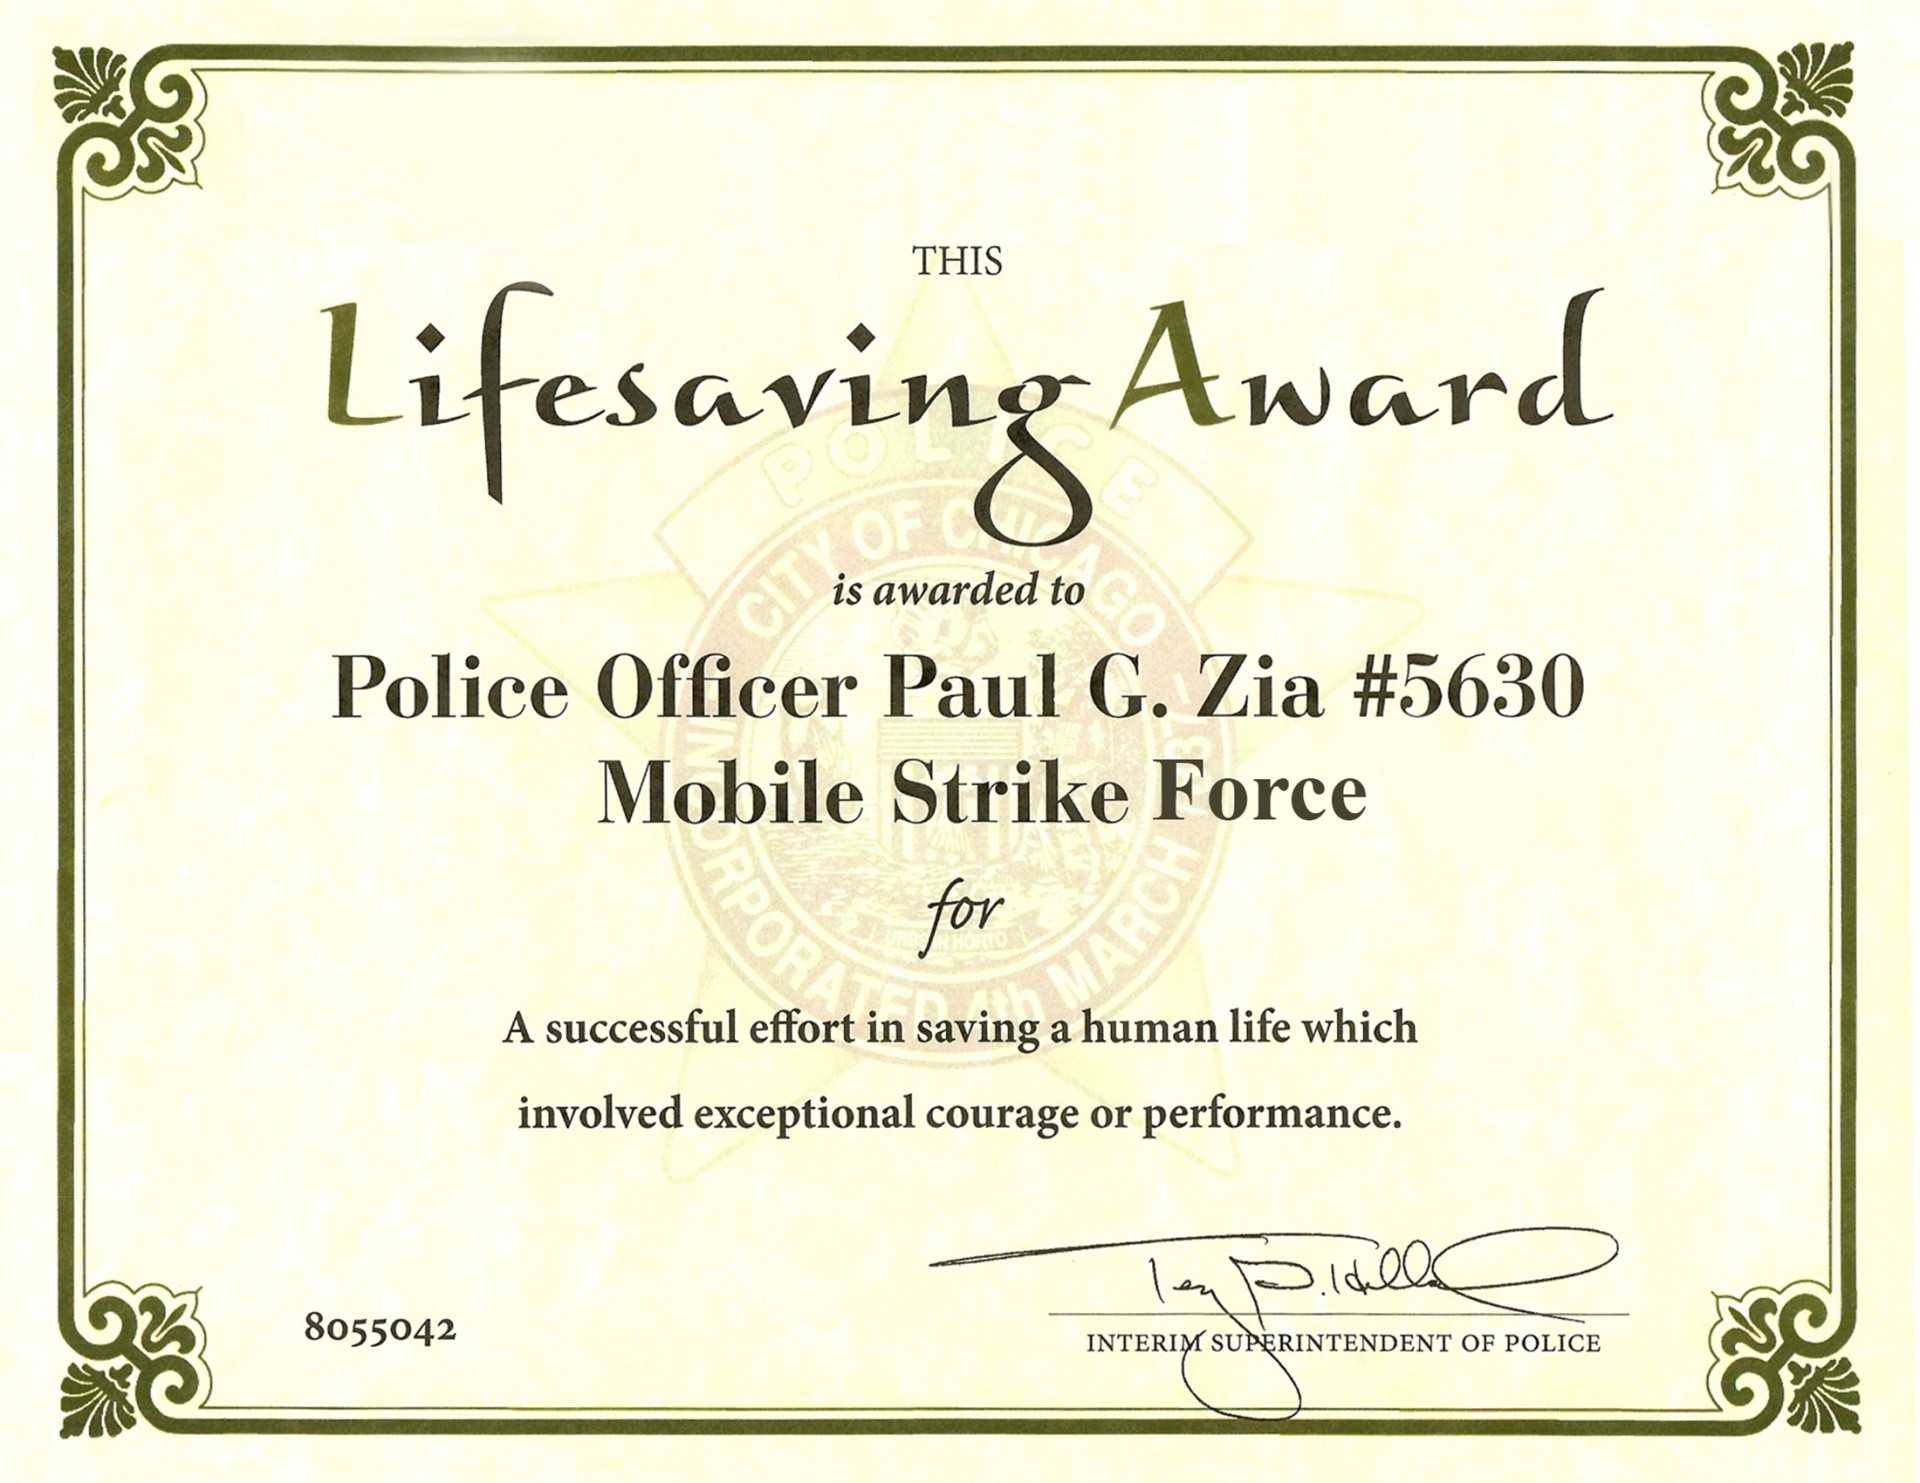 032 Scholarship Award Certificate Template Ideas Sample Throughout Life Saving Award Certificate Template